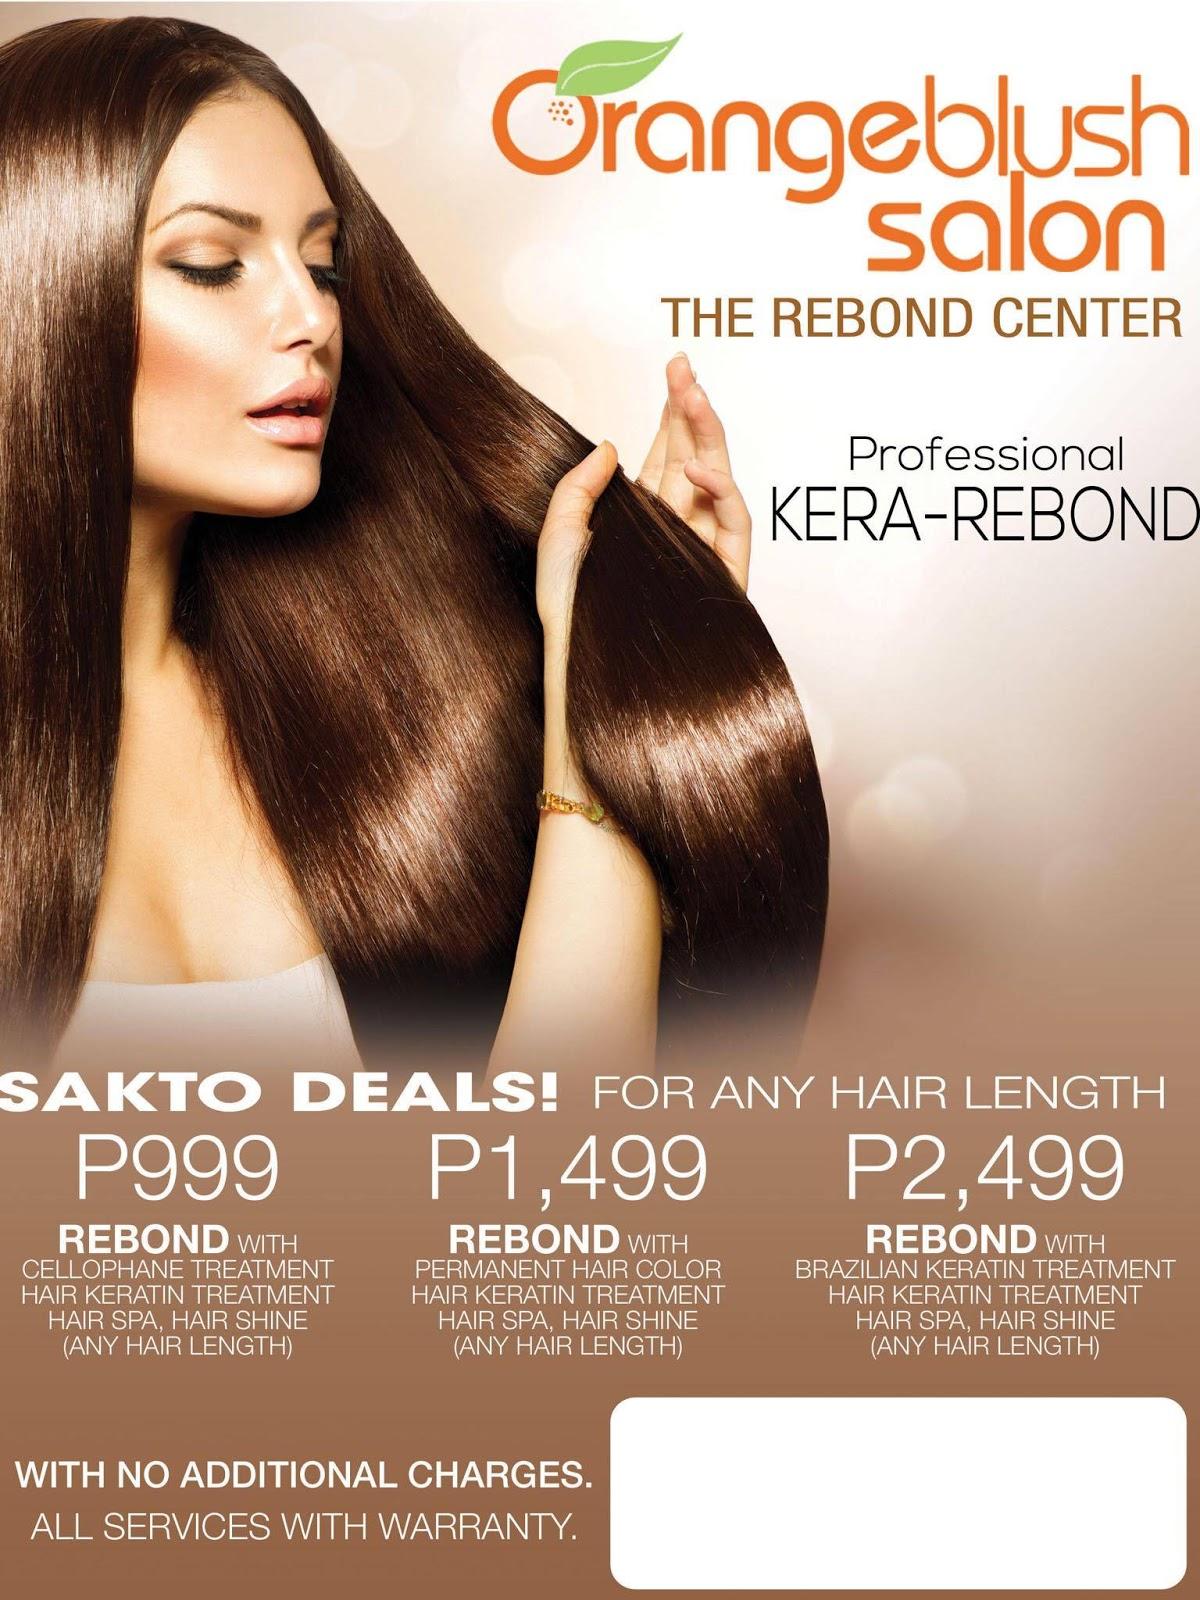 Affordable Orange Blush Hair Deals For The Beautiful You Enjoying